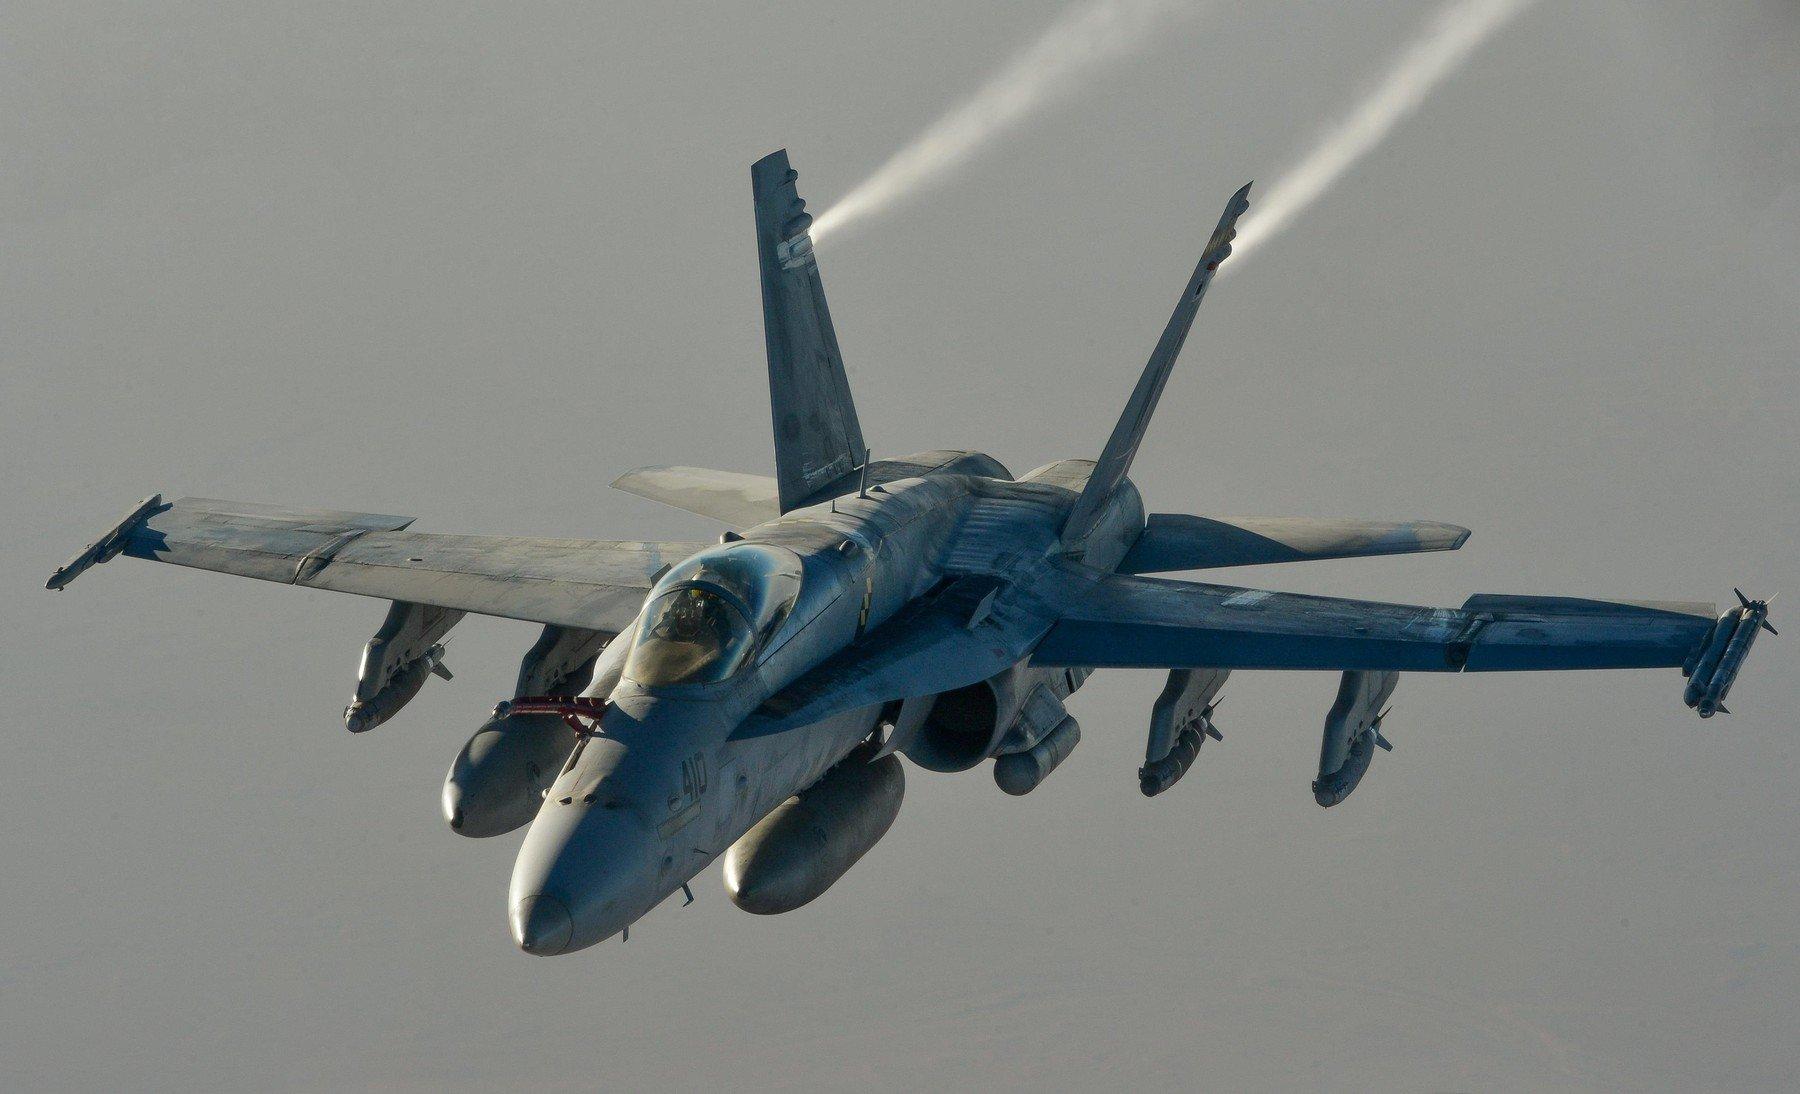 F/A-18E Super Hornet u letu iznad Iraka